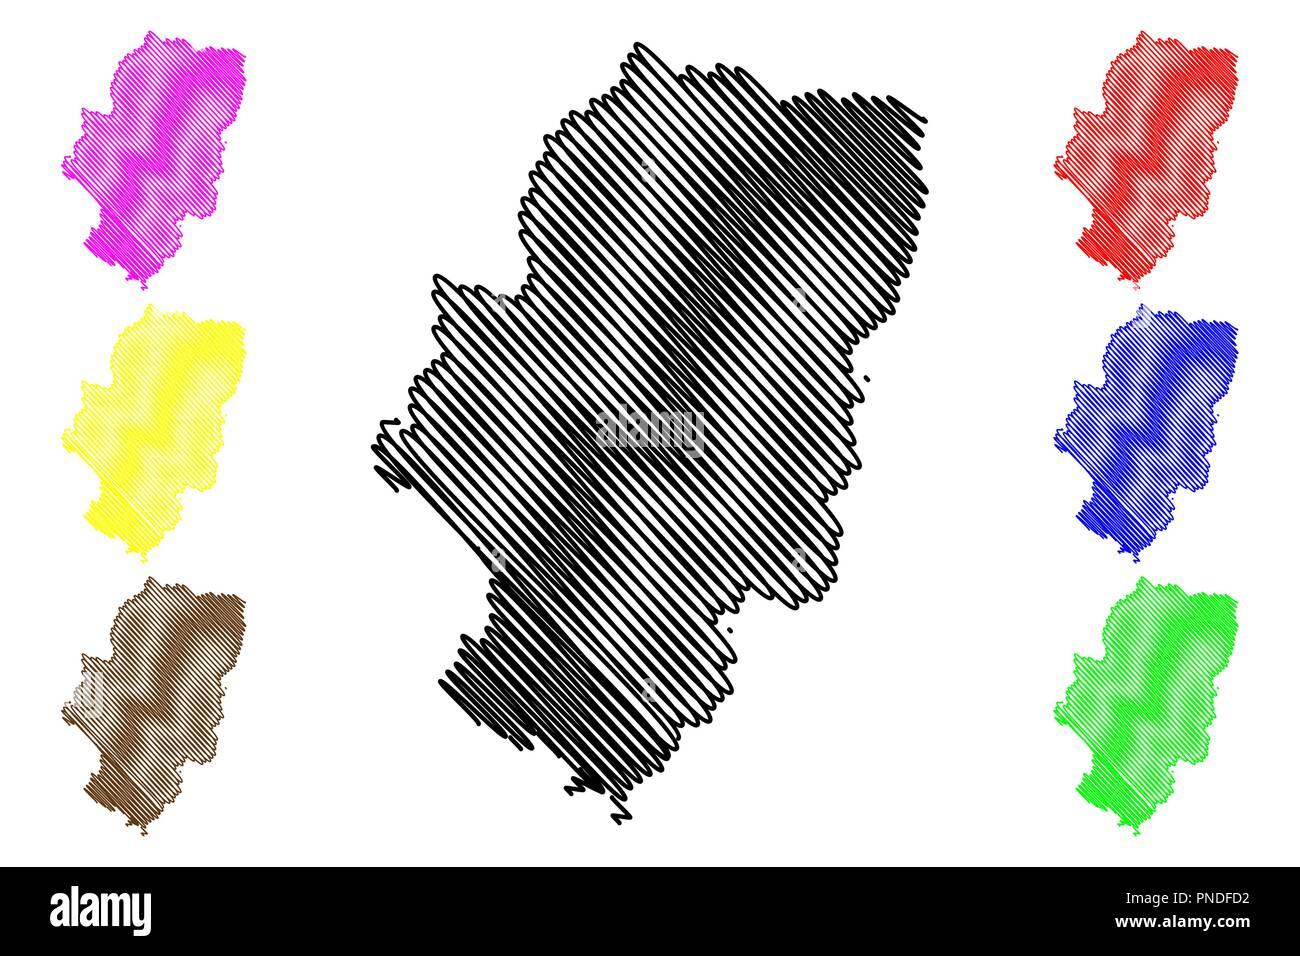 Aragon Kingdom Of Spain Autonomous Community Map Vector